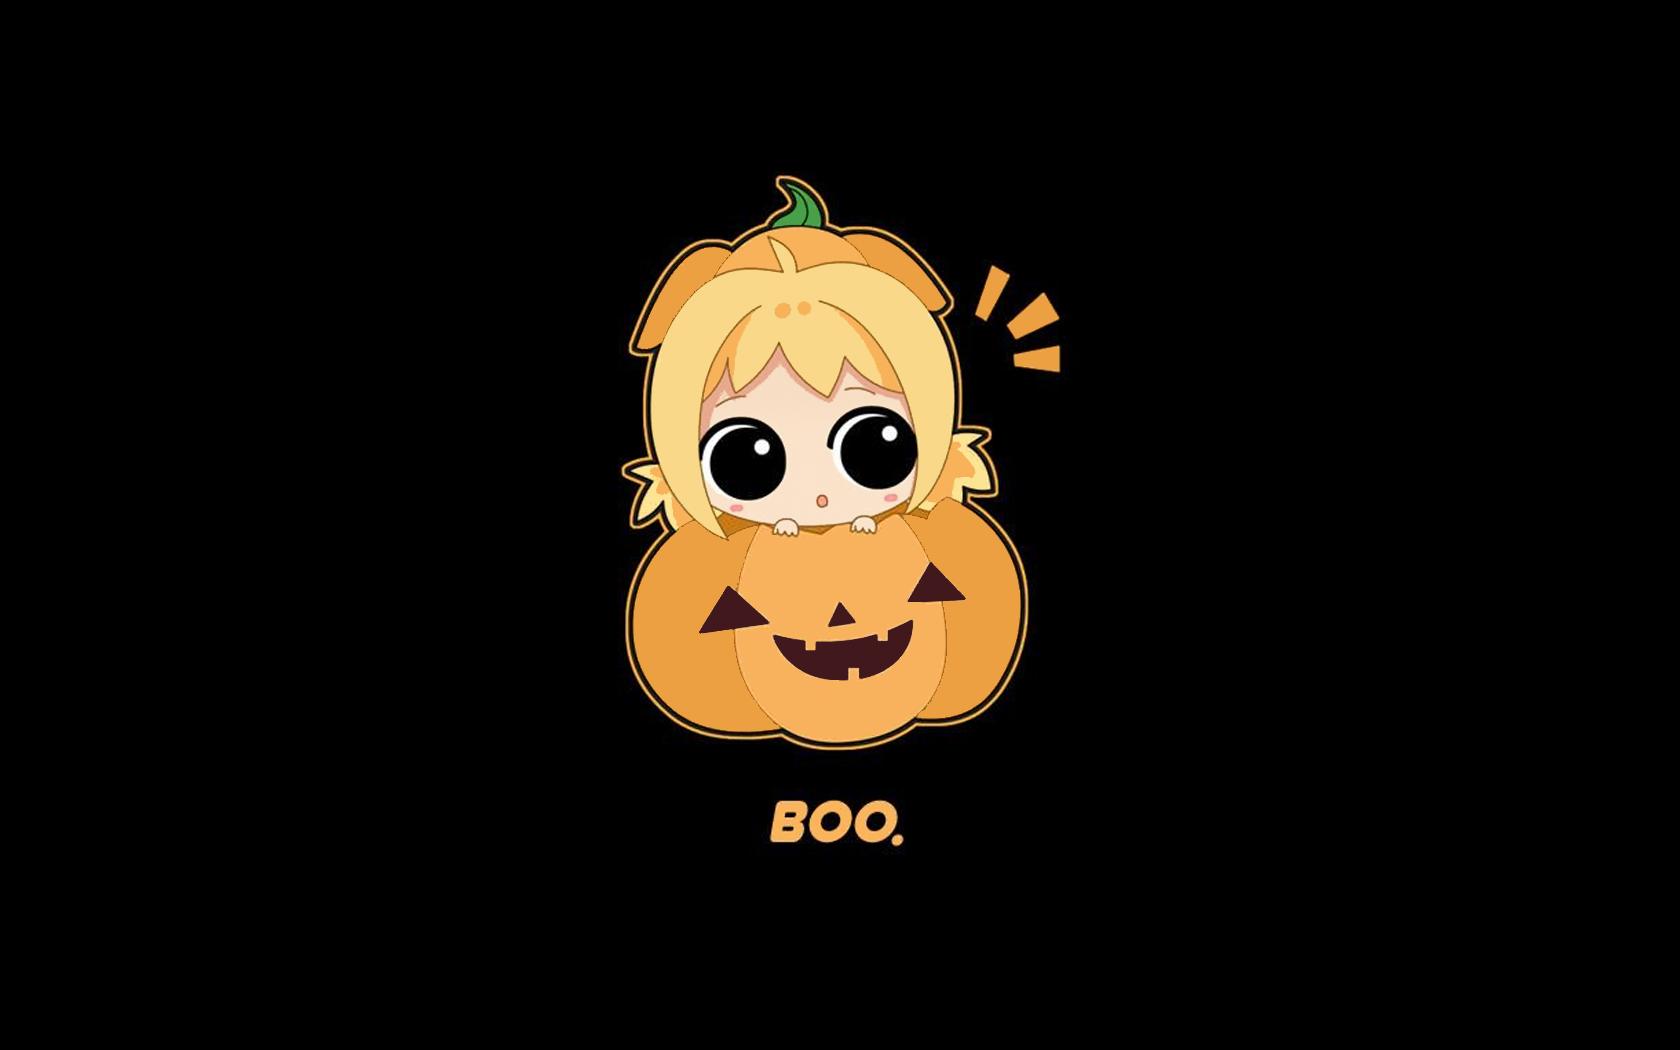 48 Cute Halloween Wallpapers For Desktop On Wallpapersafari